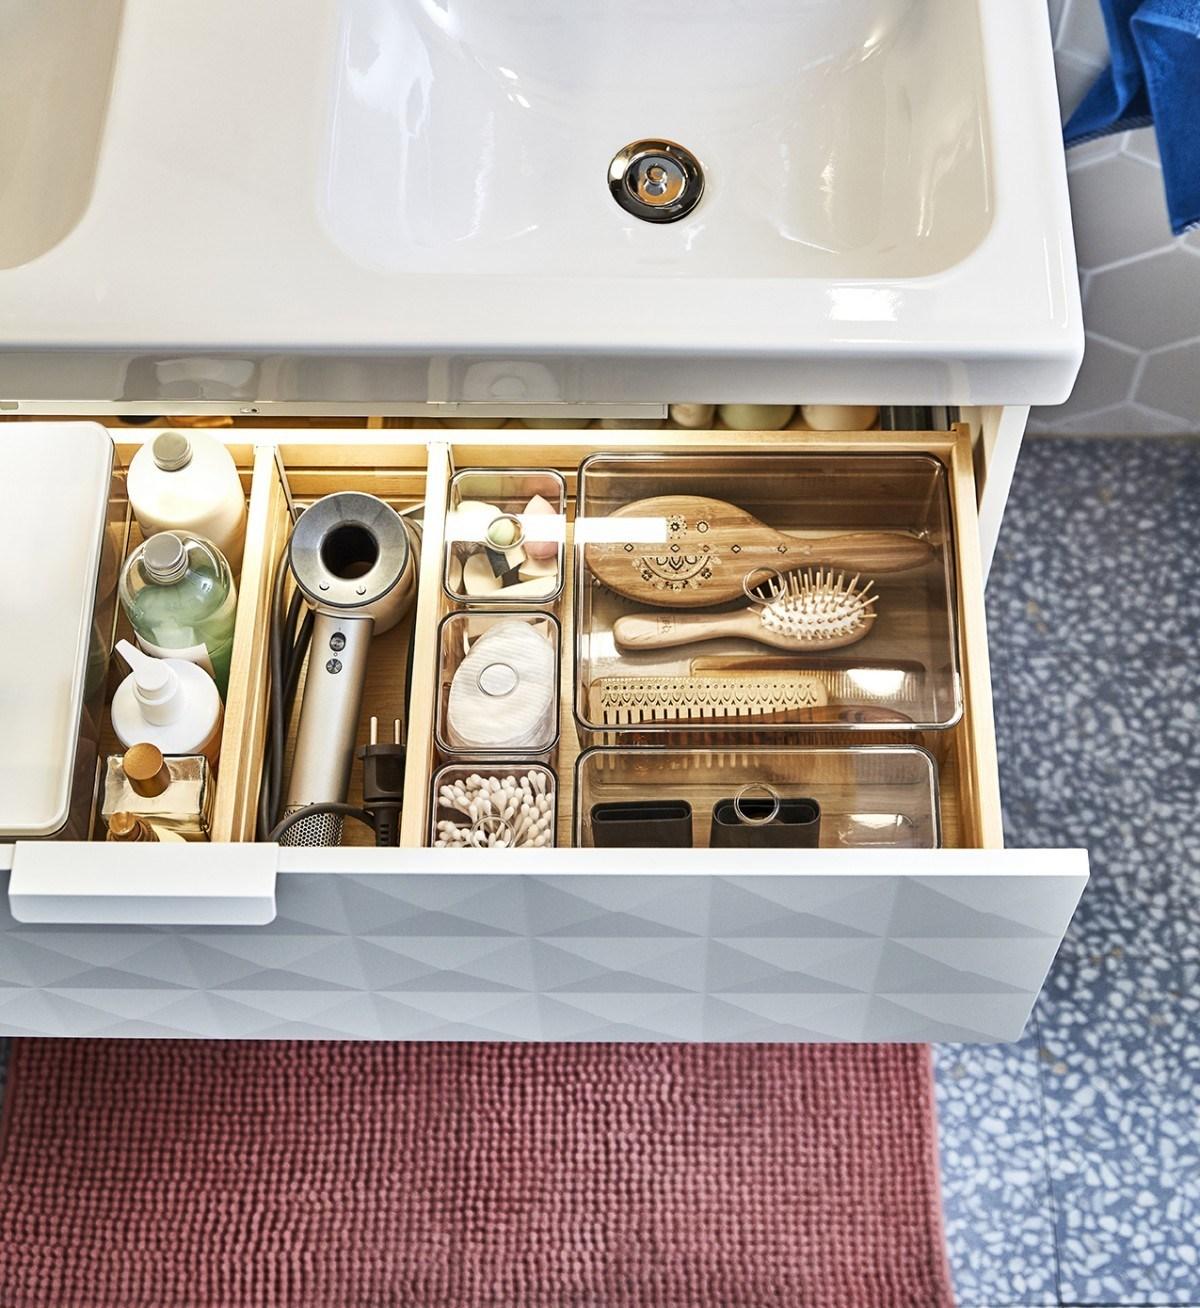 Novedades catálogo Ikea 2020 sistema de almacenaje para baño transparente